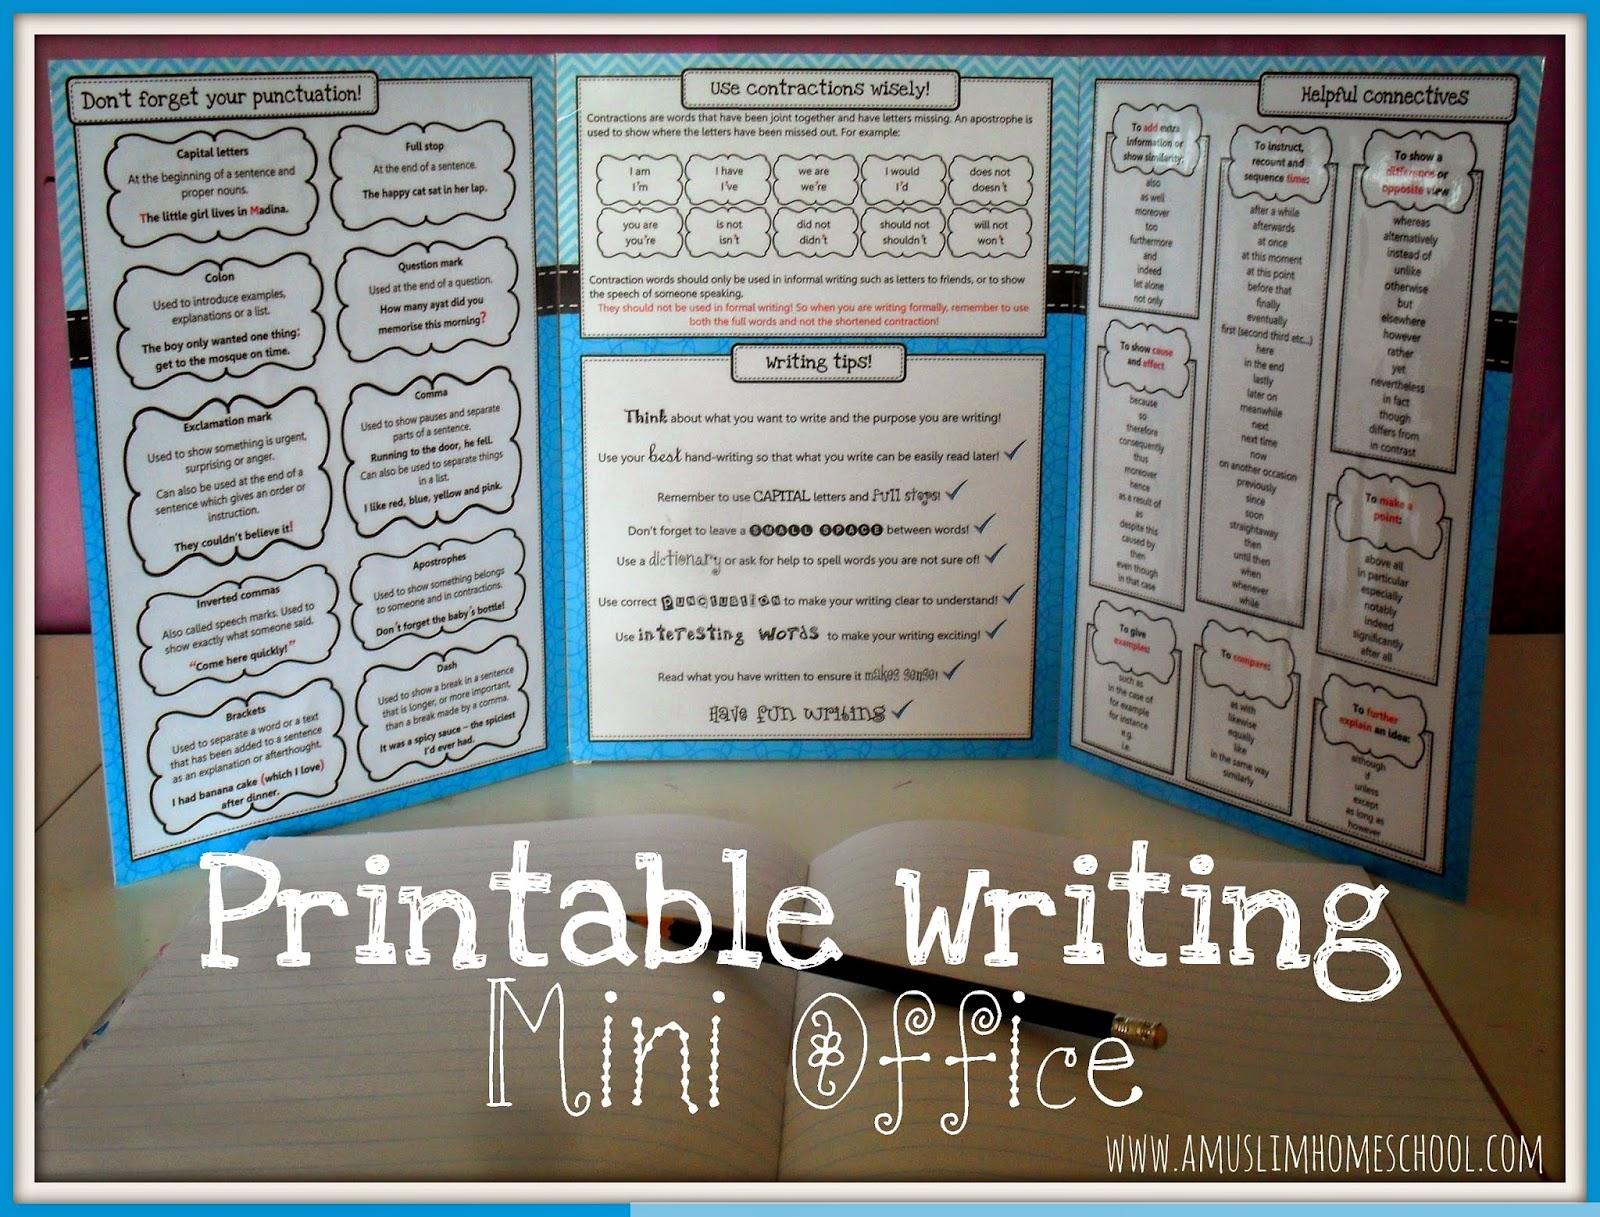 Iman S Home School Printable Writing Mini Office